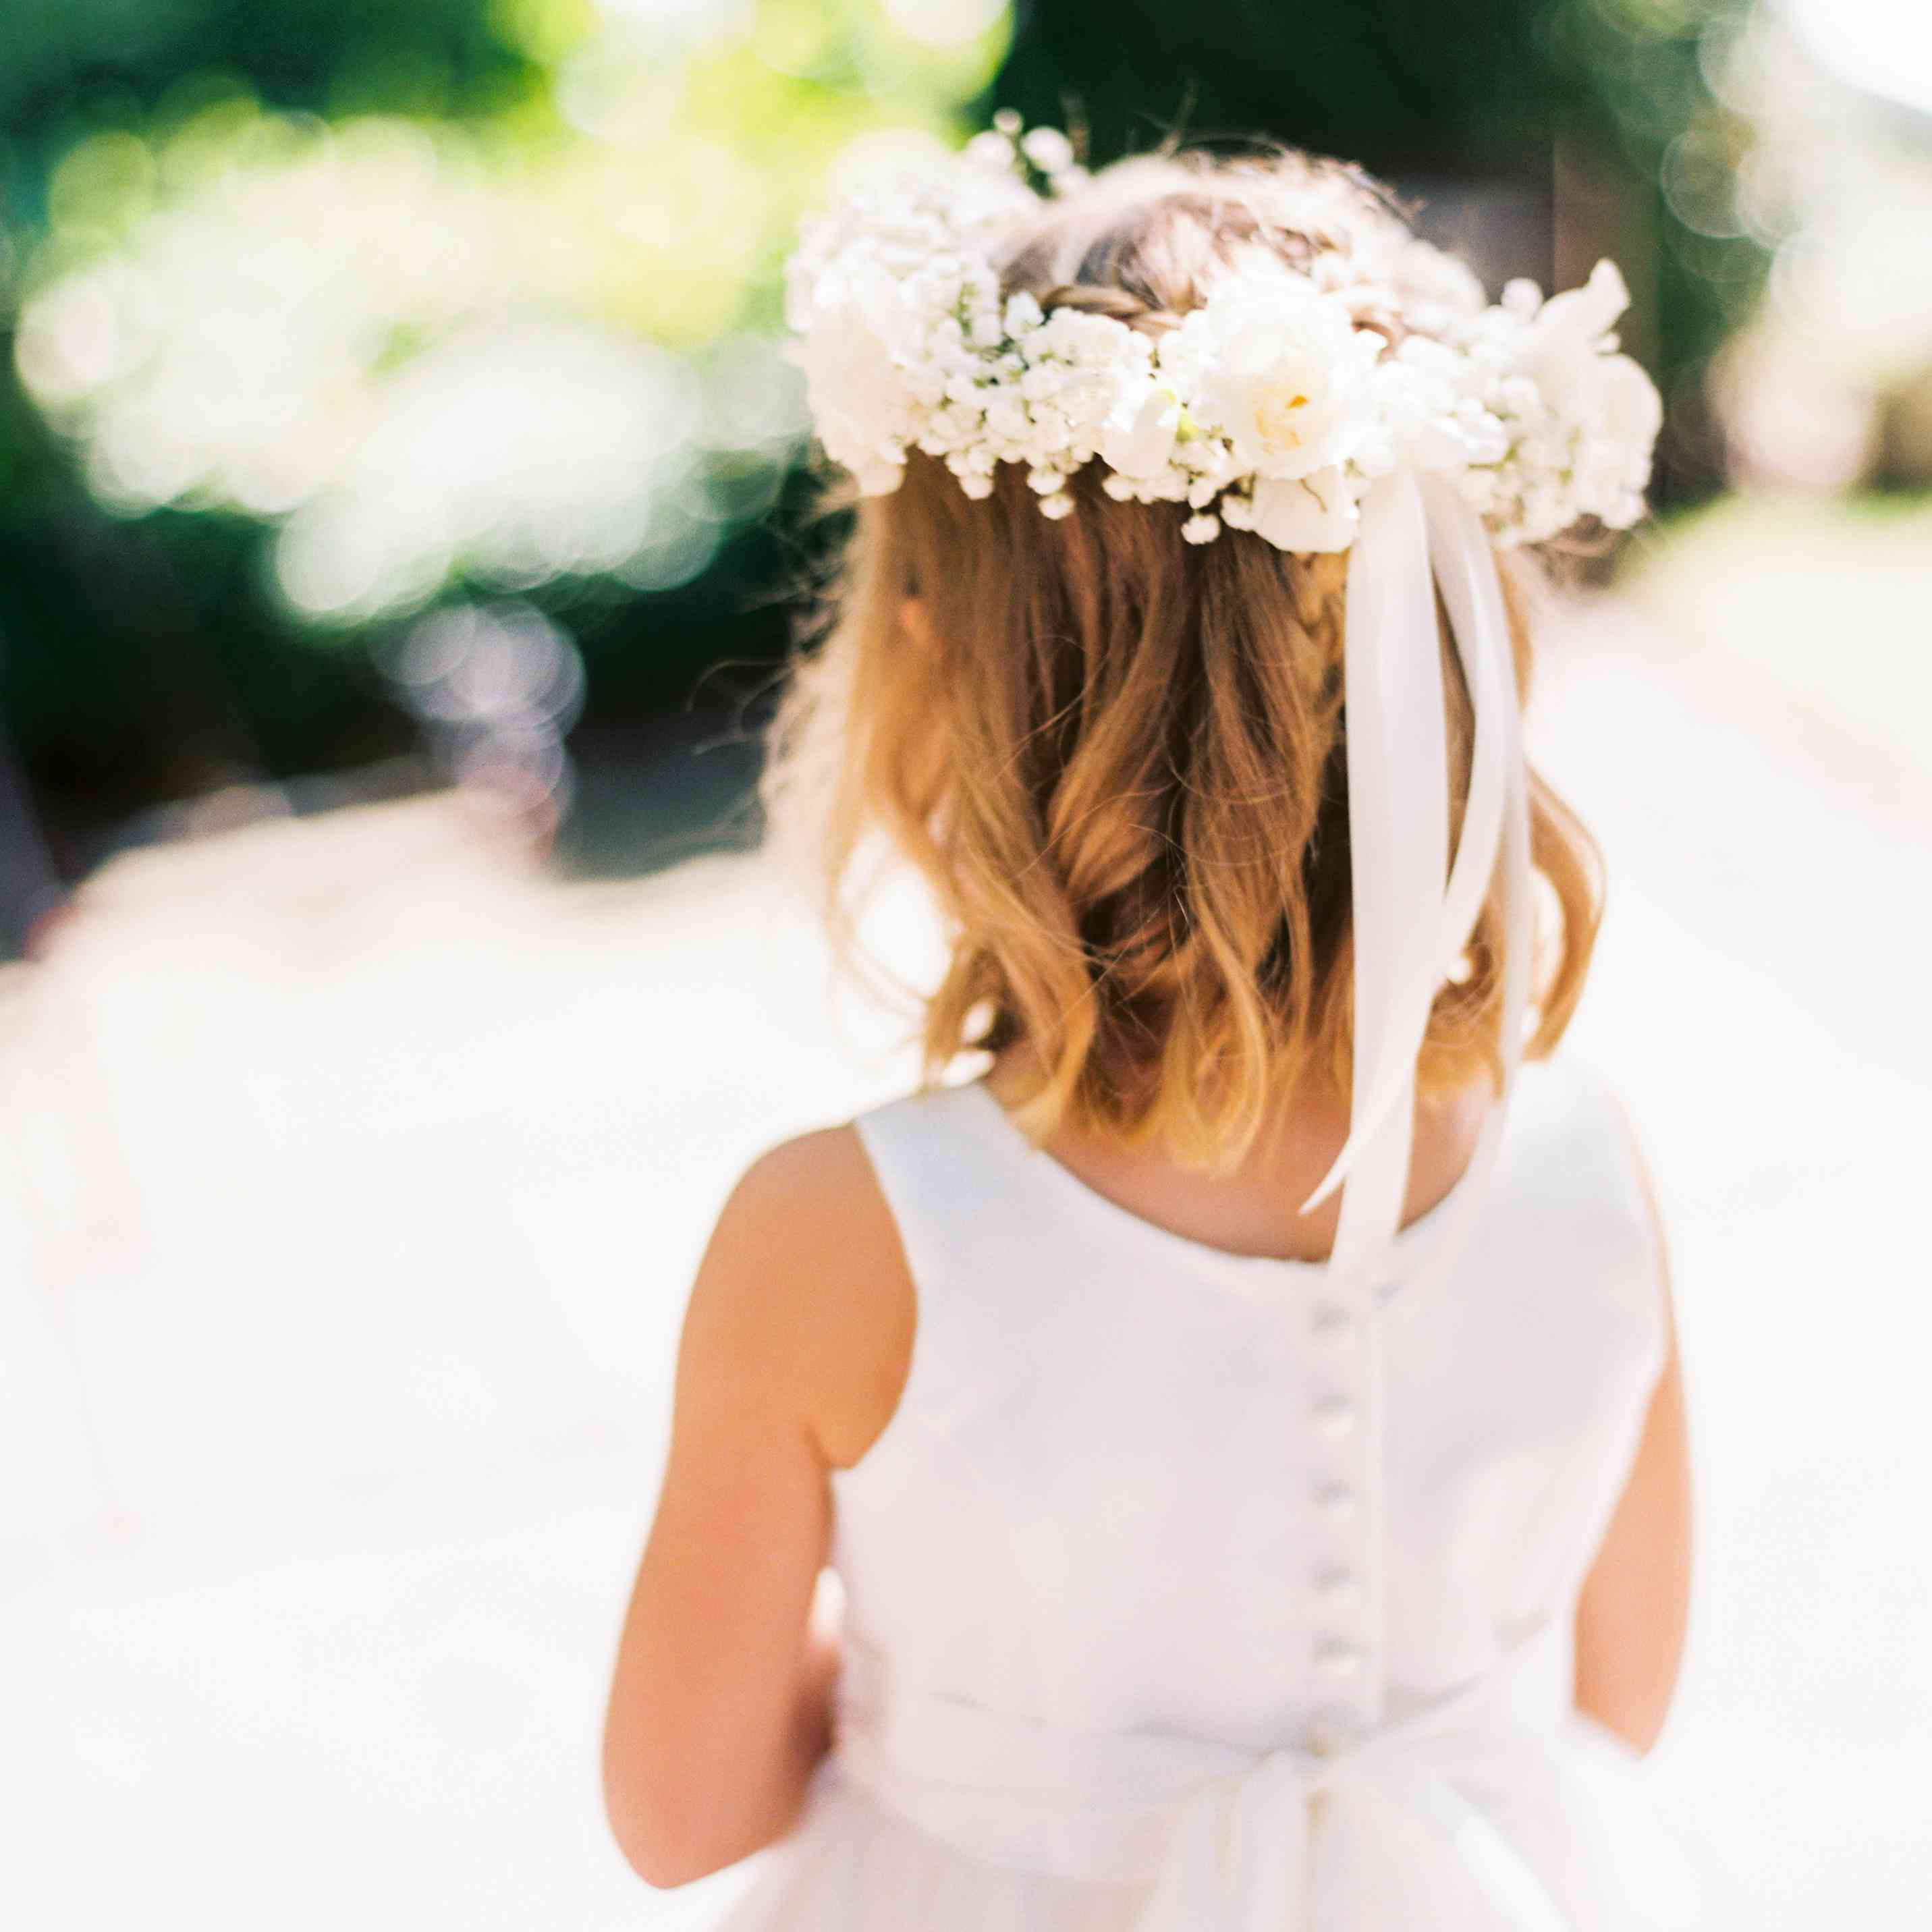 Flower girl wearing flower crown